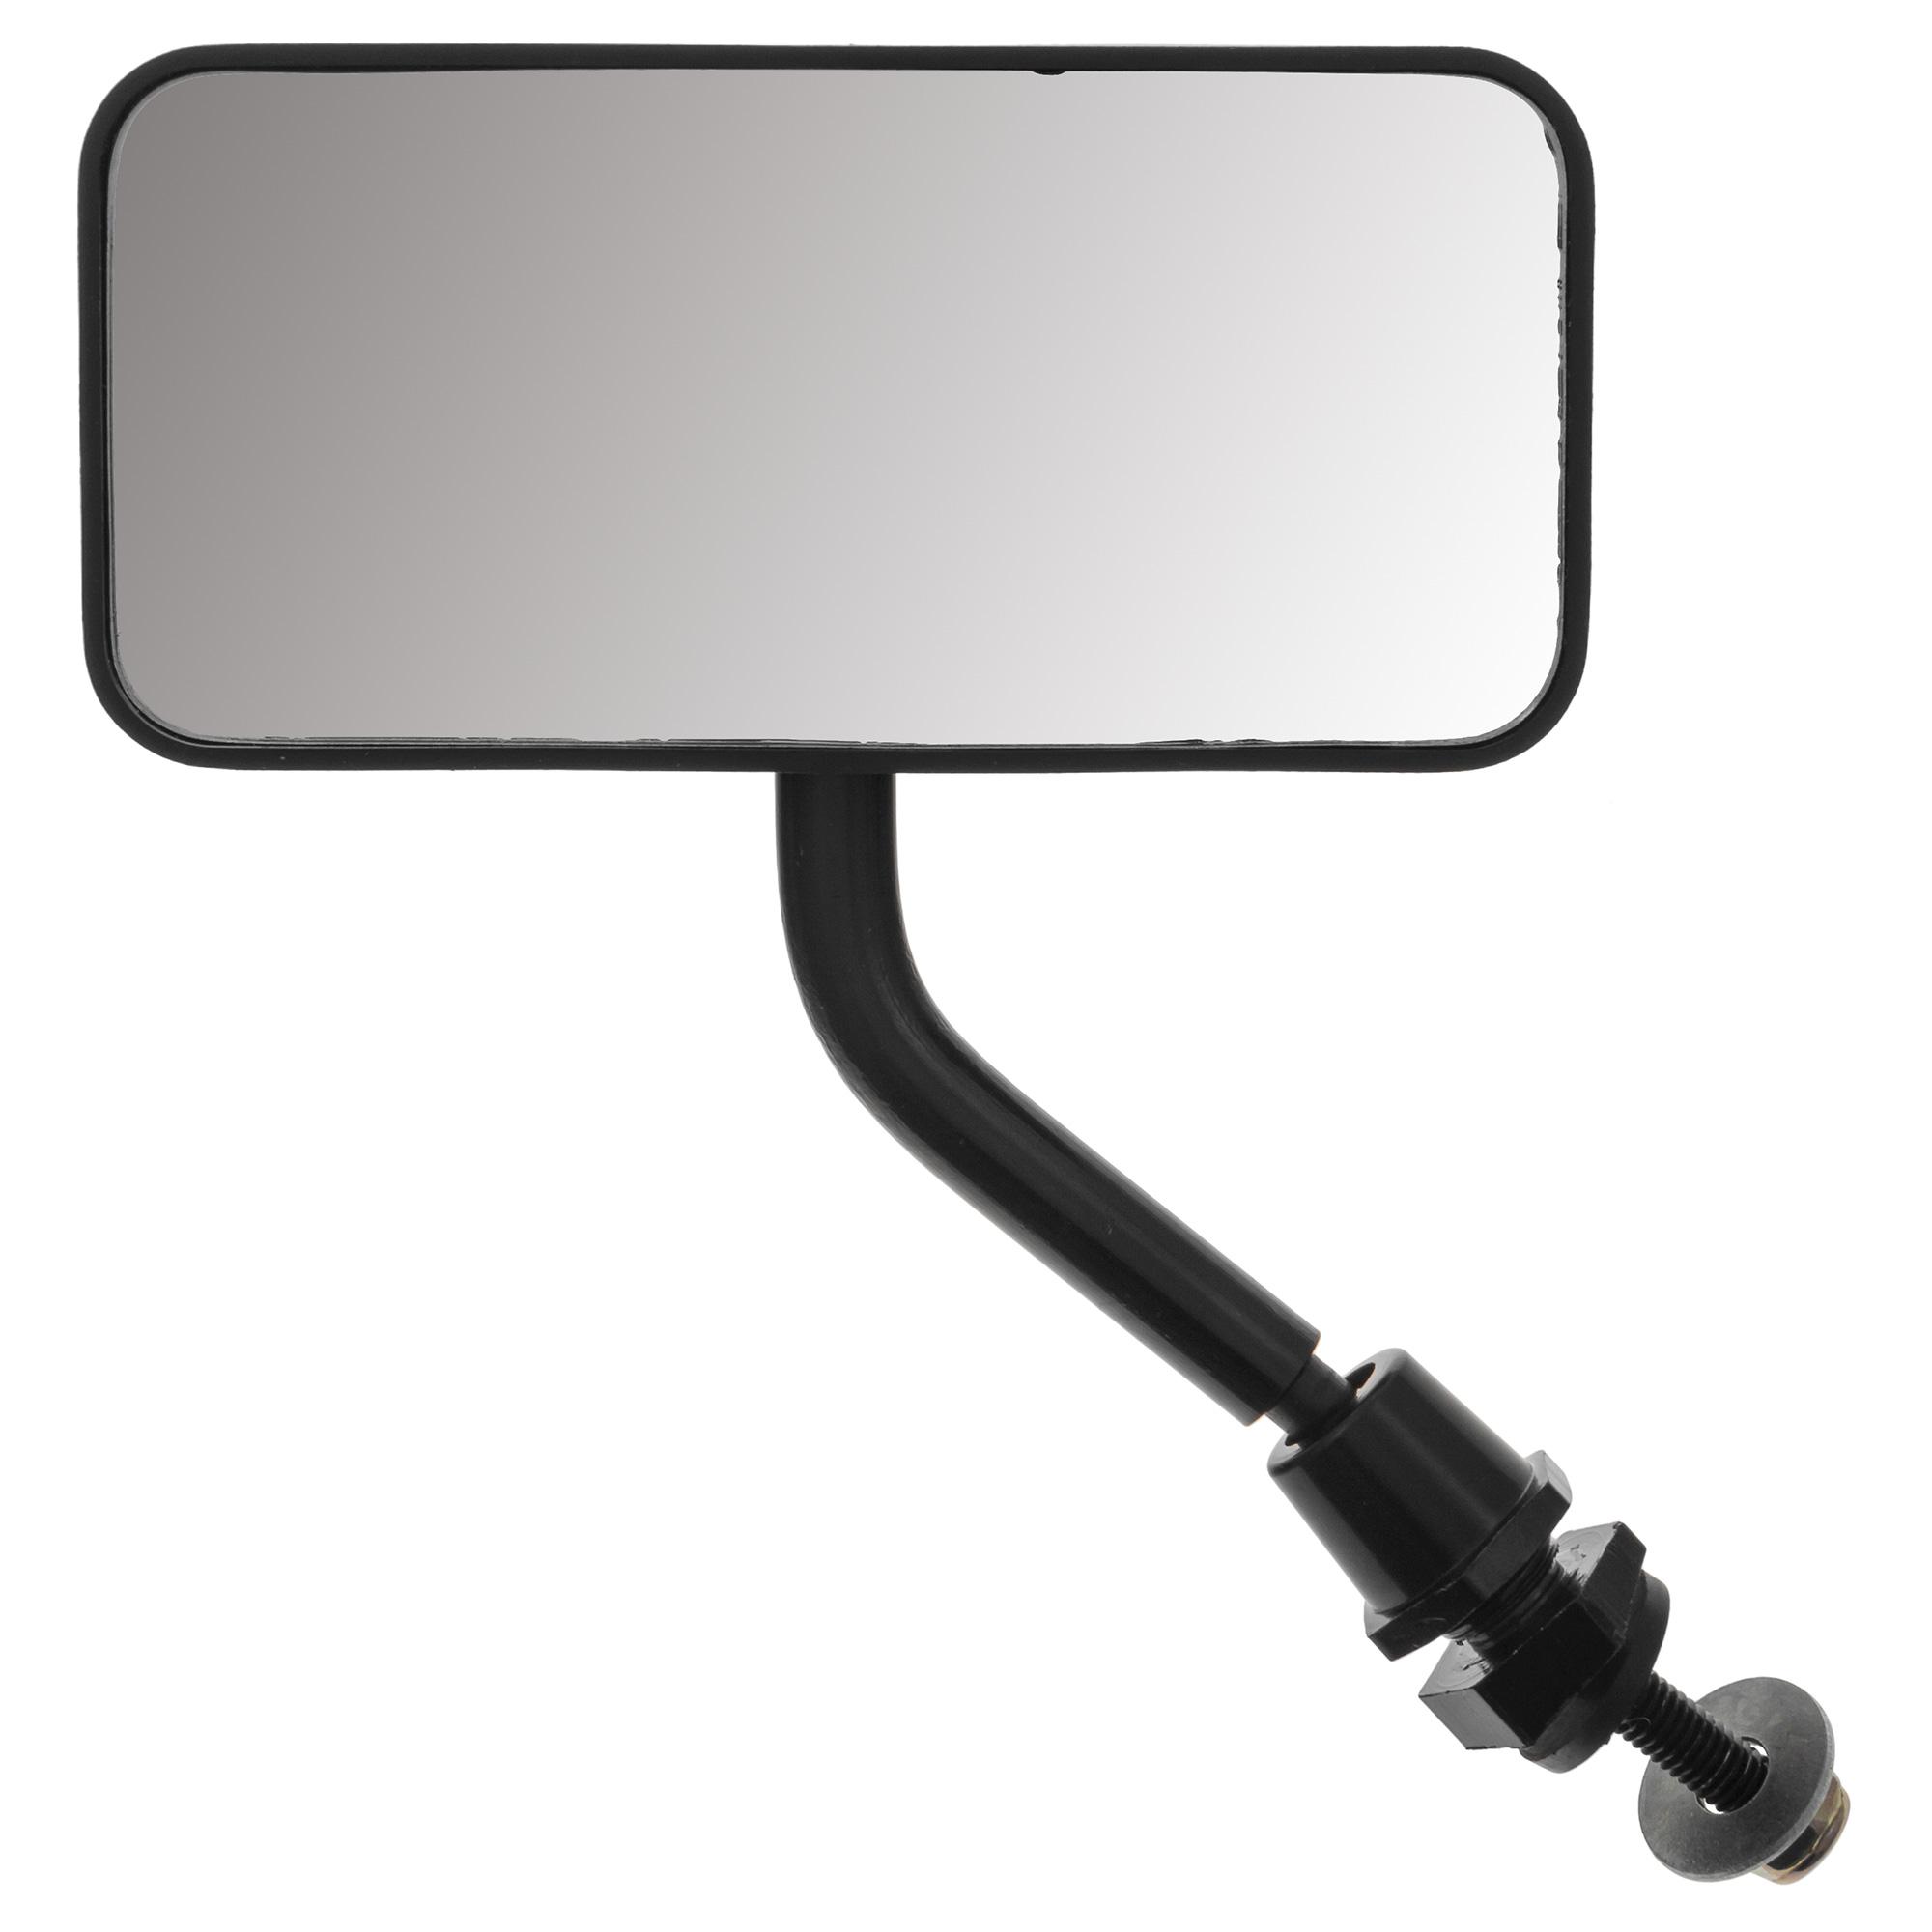 Flat door mirror 112x52mm Body 115x55x52mm F1 style Black Left//Right mounting